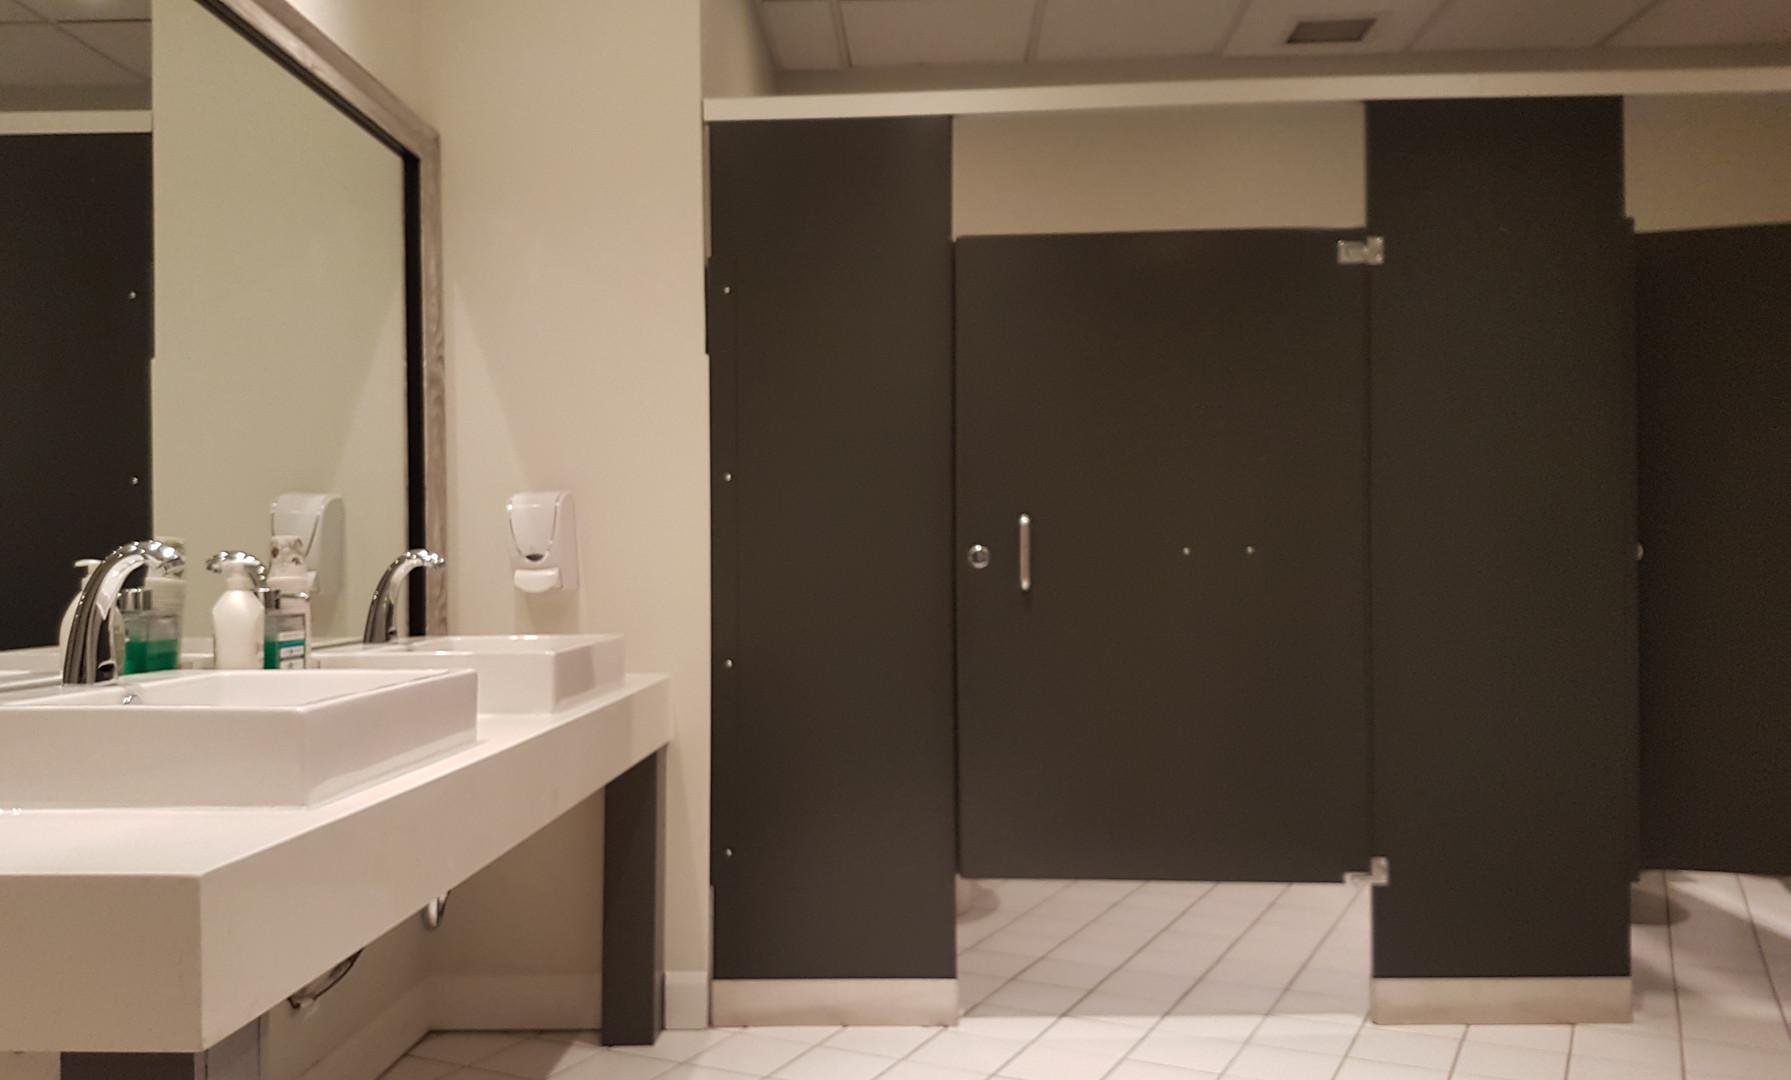 Office Washroom Update